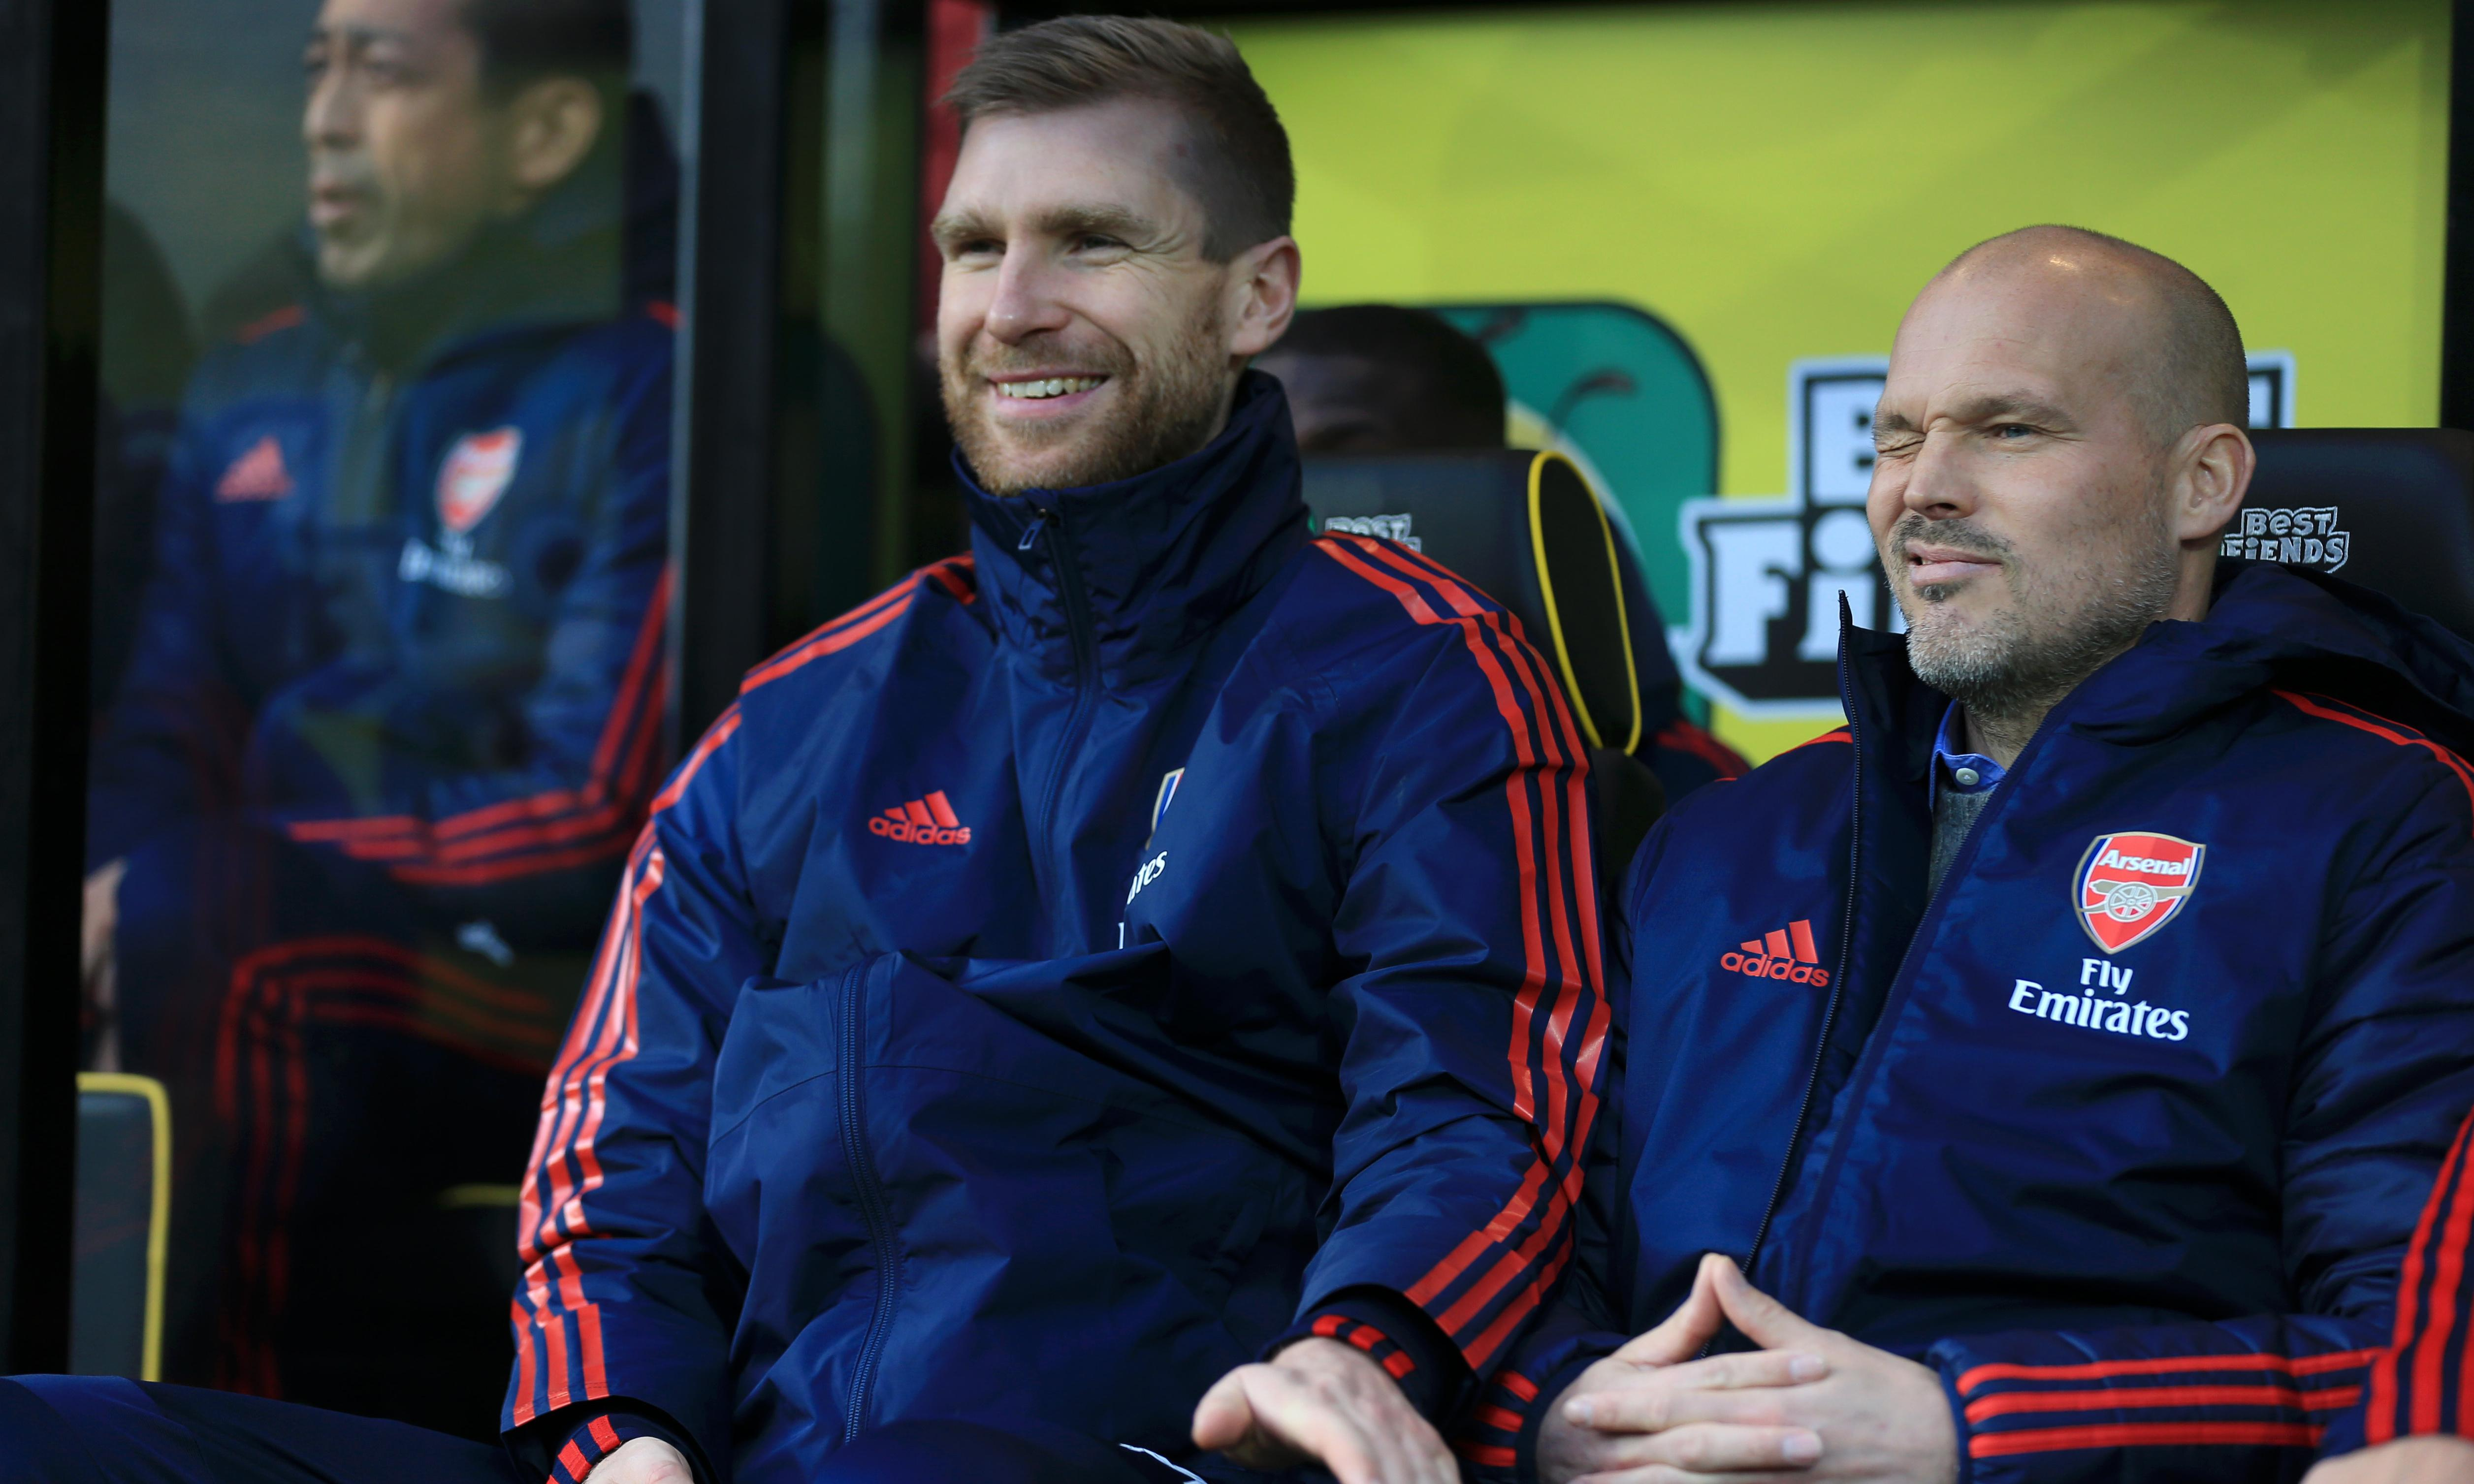 Arsenal's Freddie Ljungberg wants quick decision on Emery successor